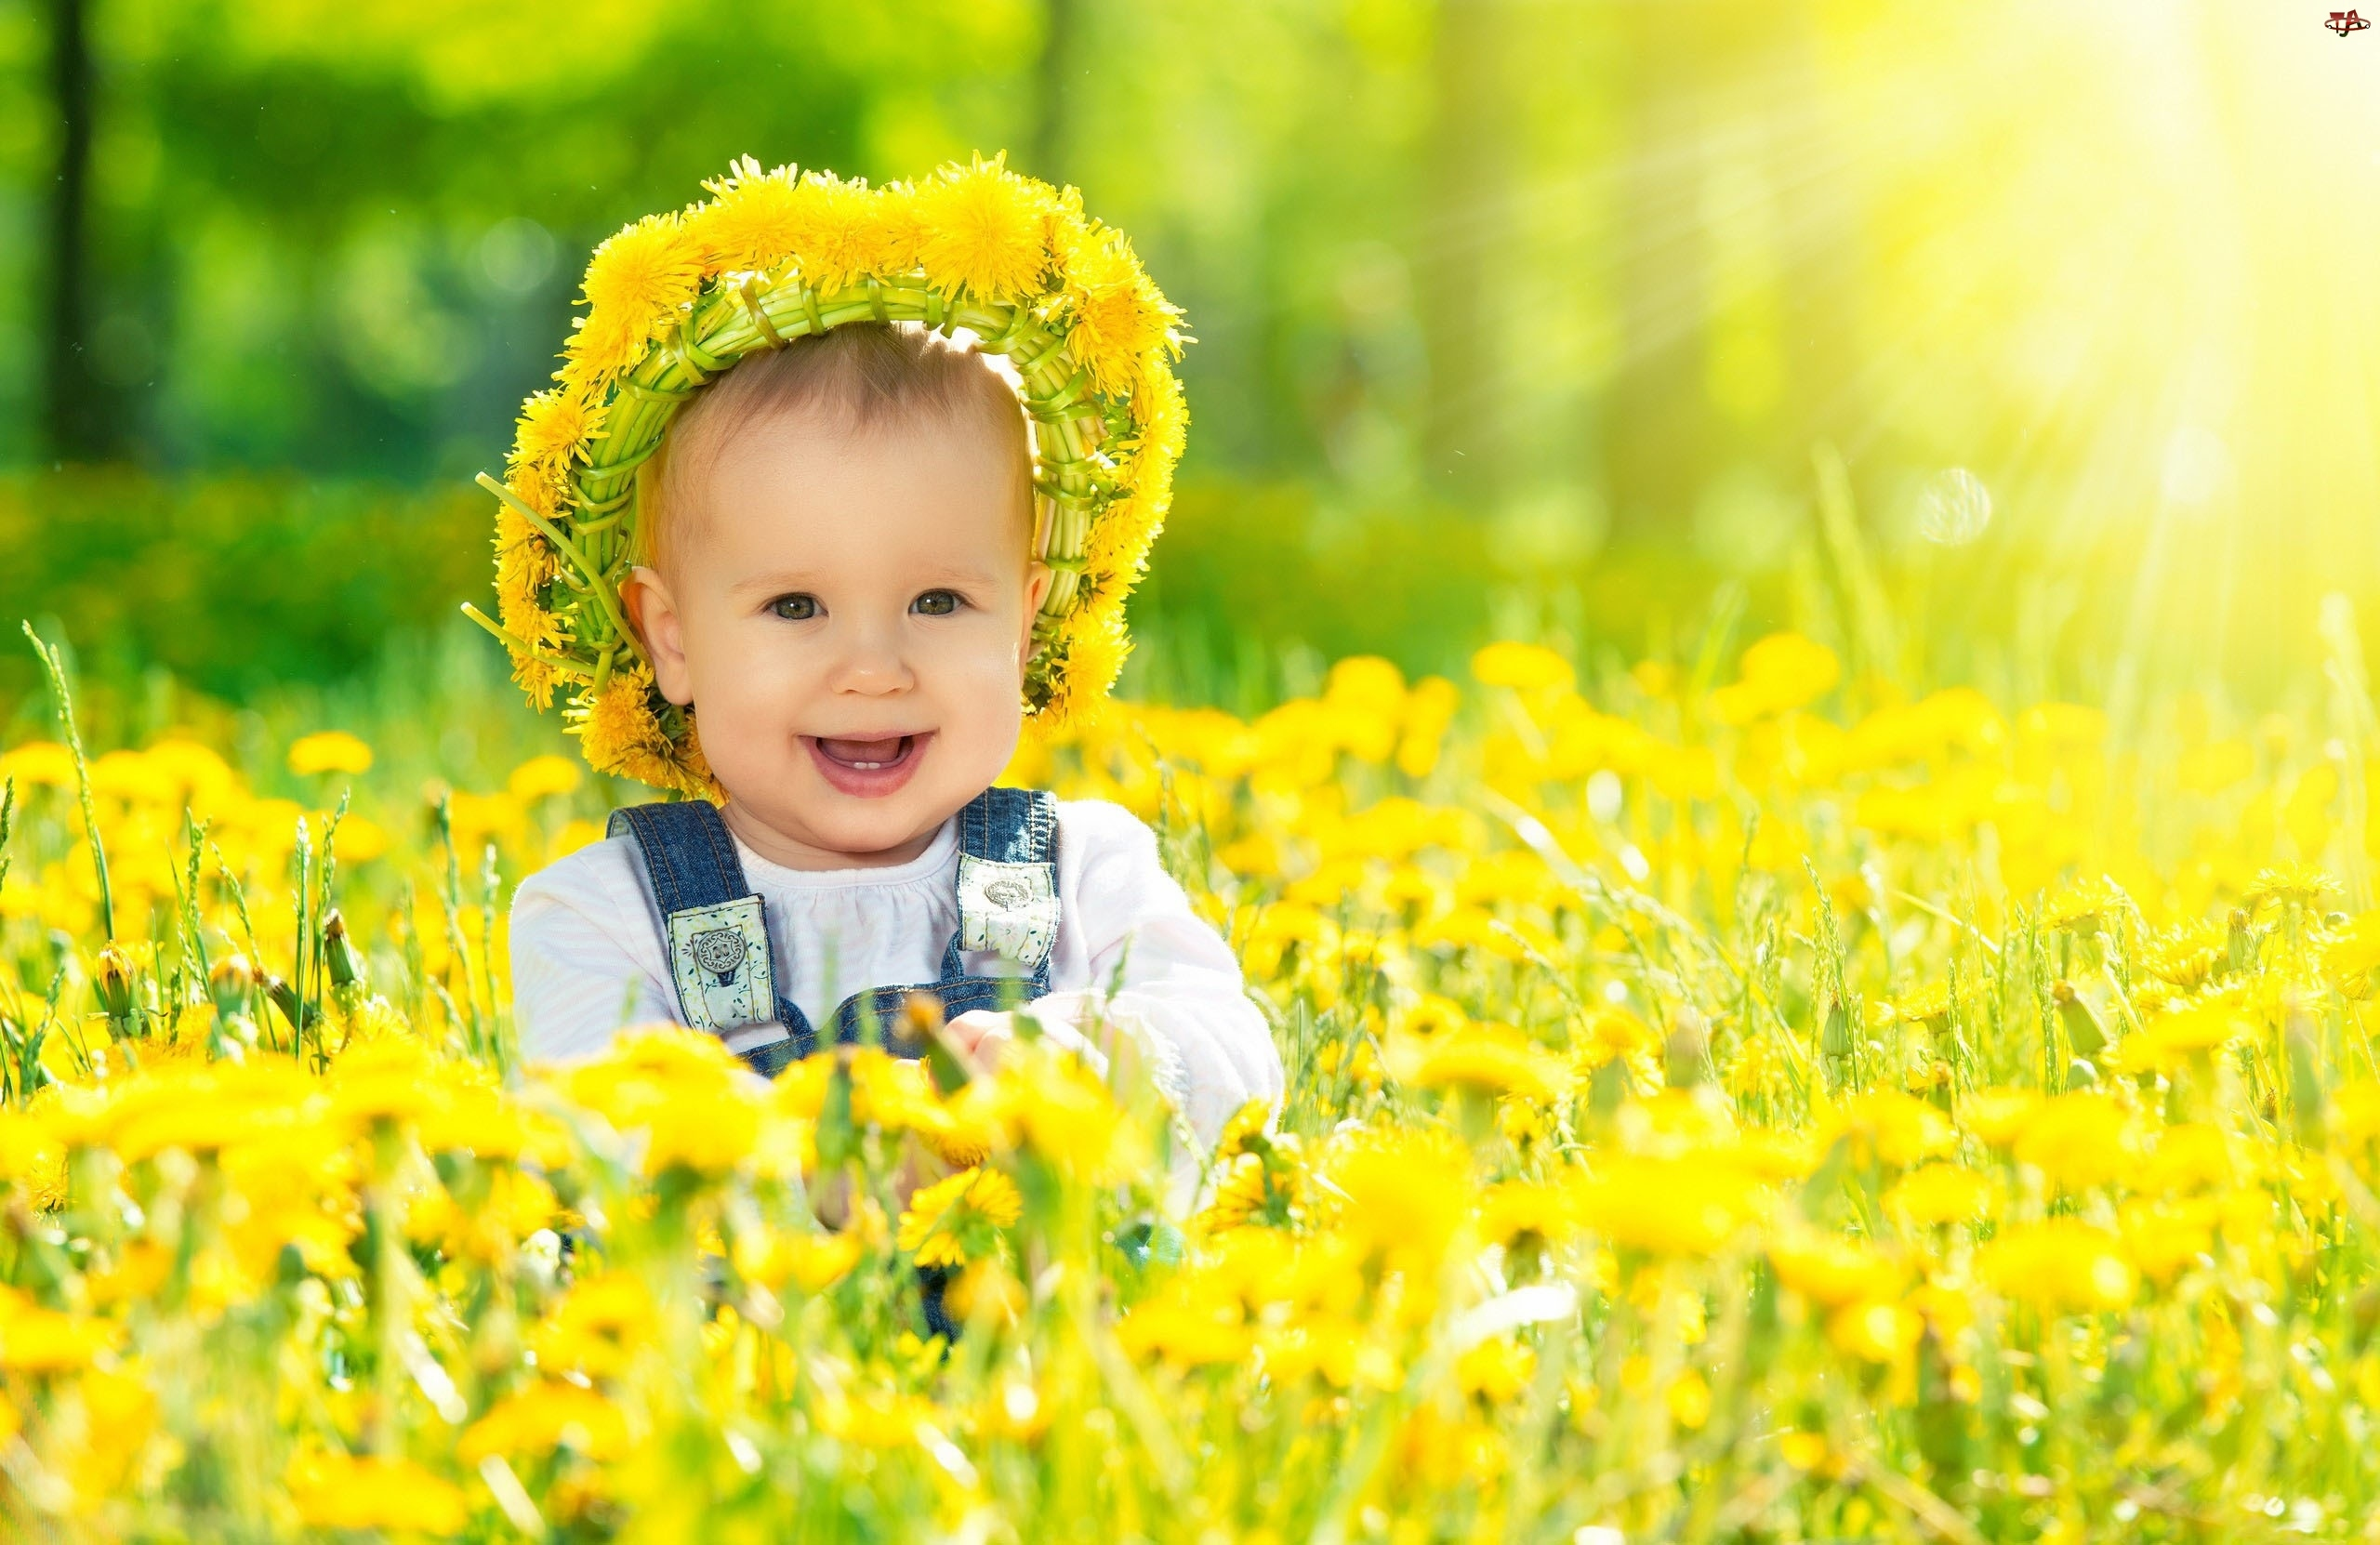 Kwiaty, Dziecko, Wianek